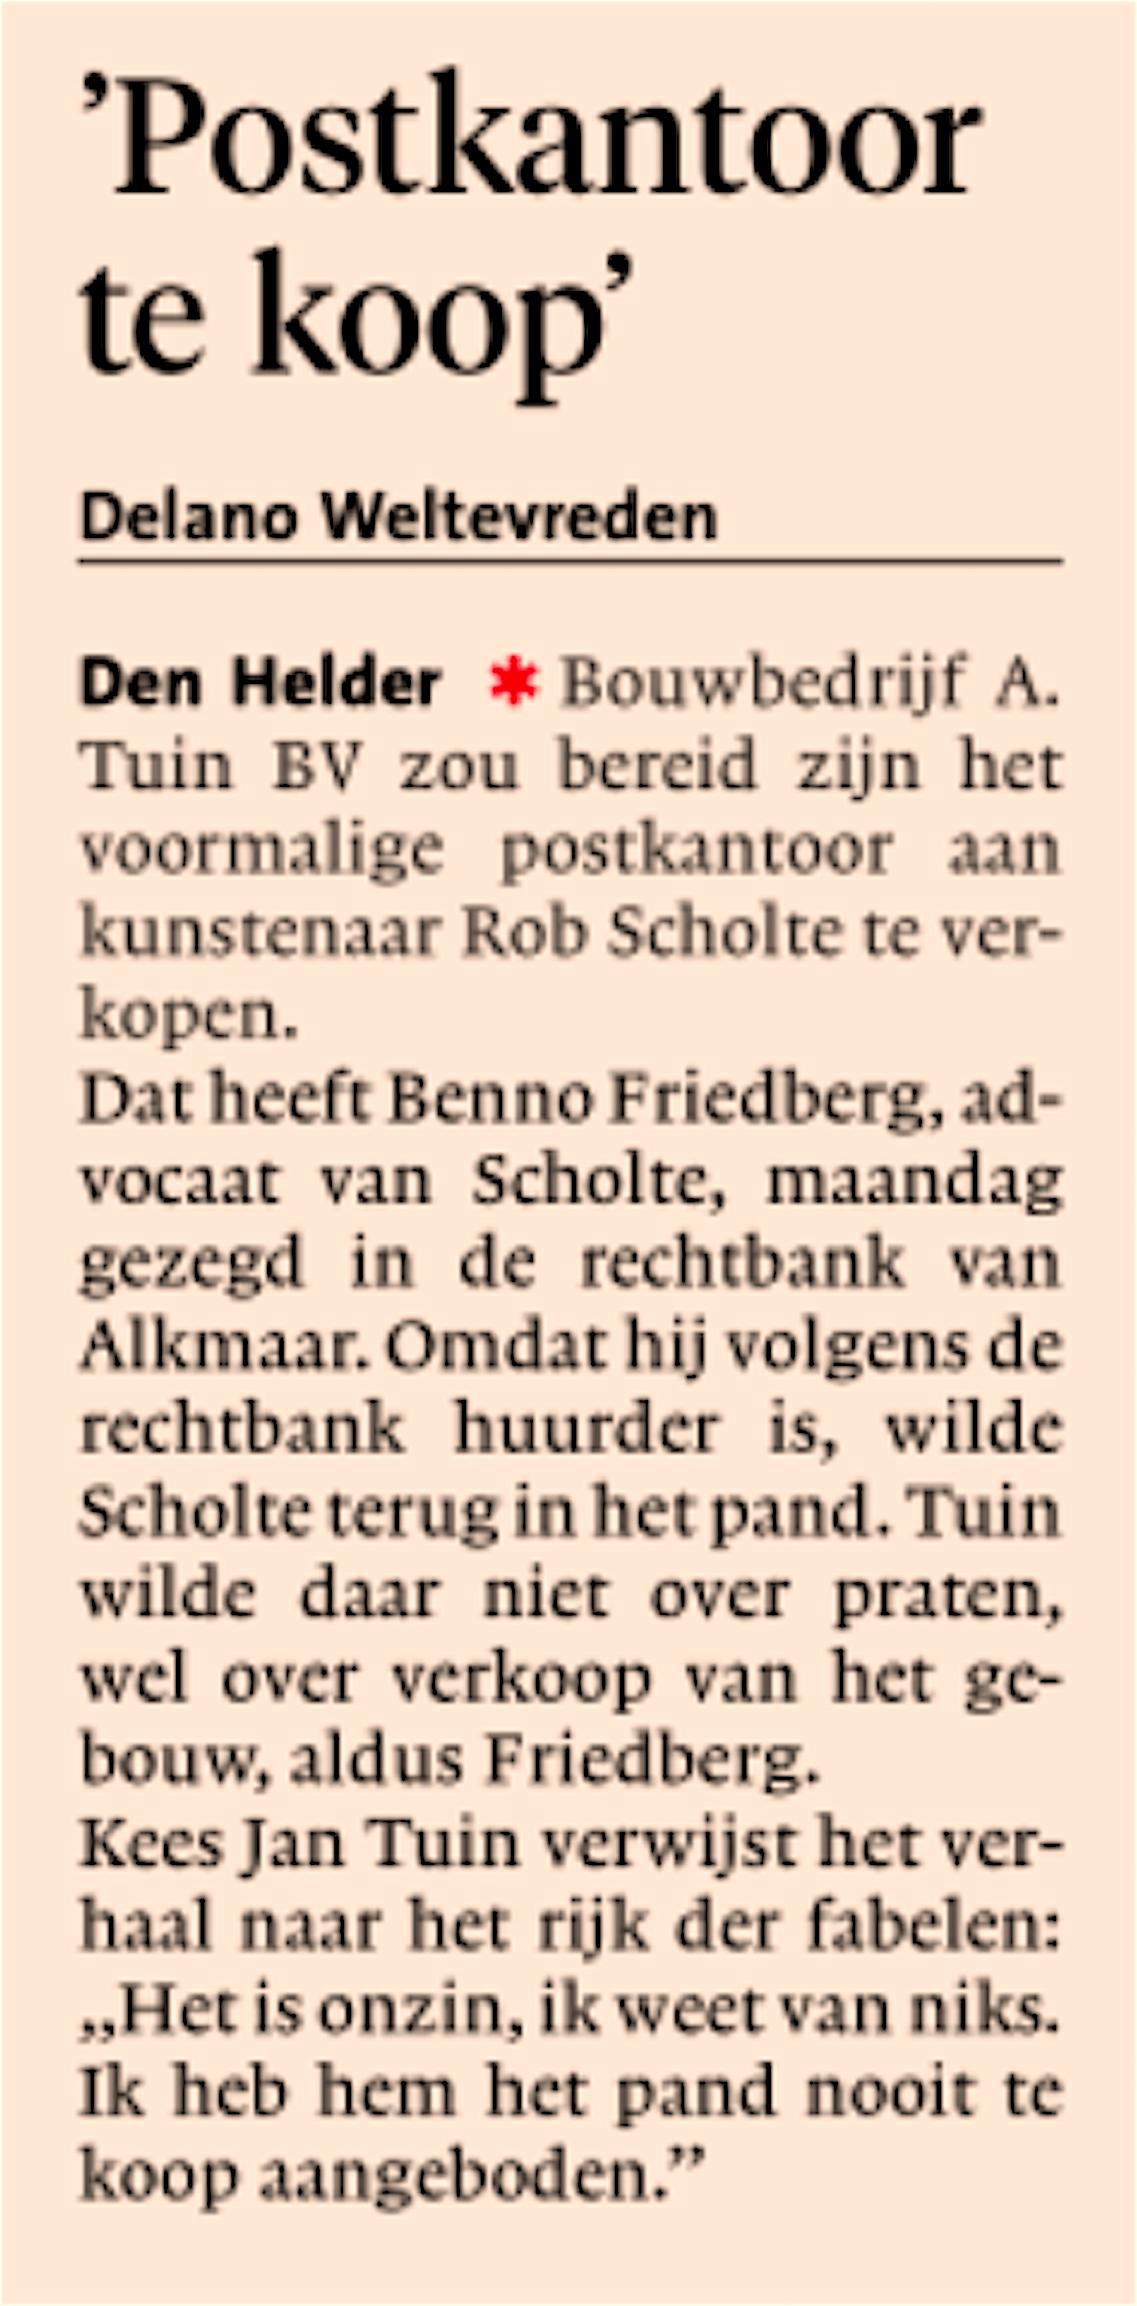 Noordhollands Dagblad, 11 december 2018